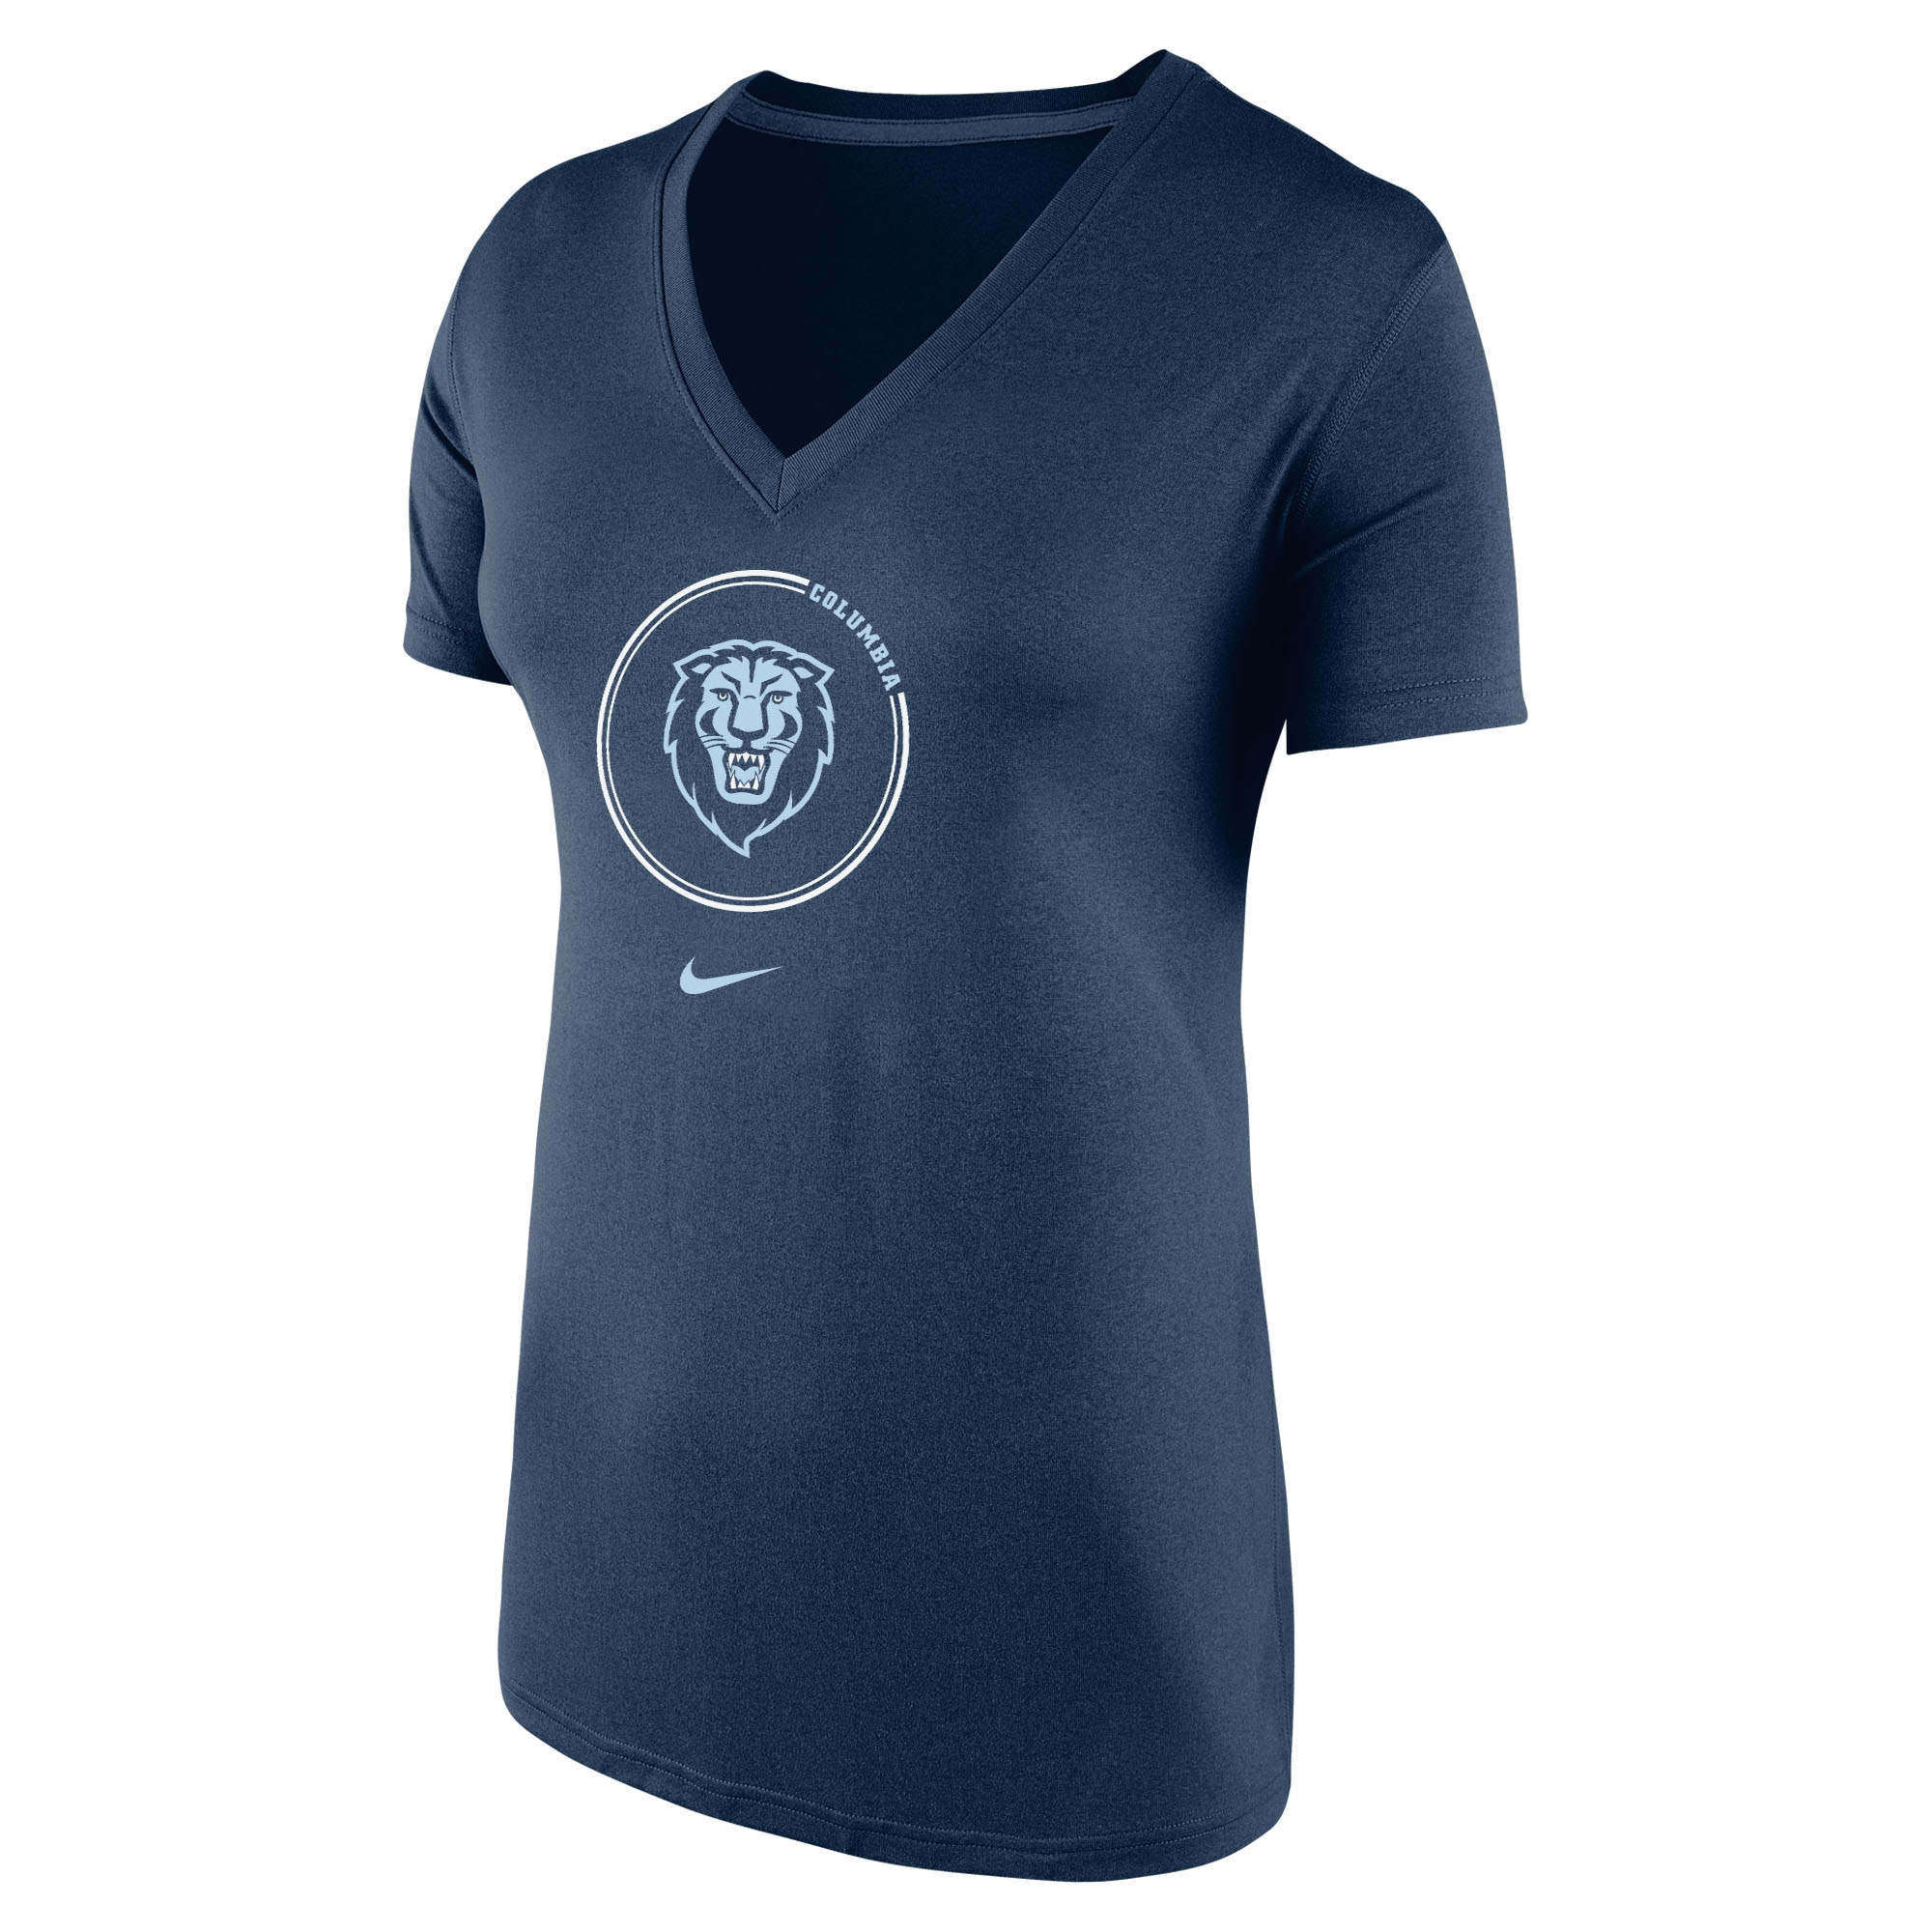 Nike Women's Dri Fit Short Sleeve V Neck T Shirt